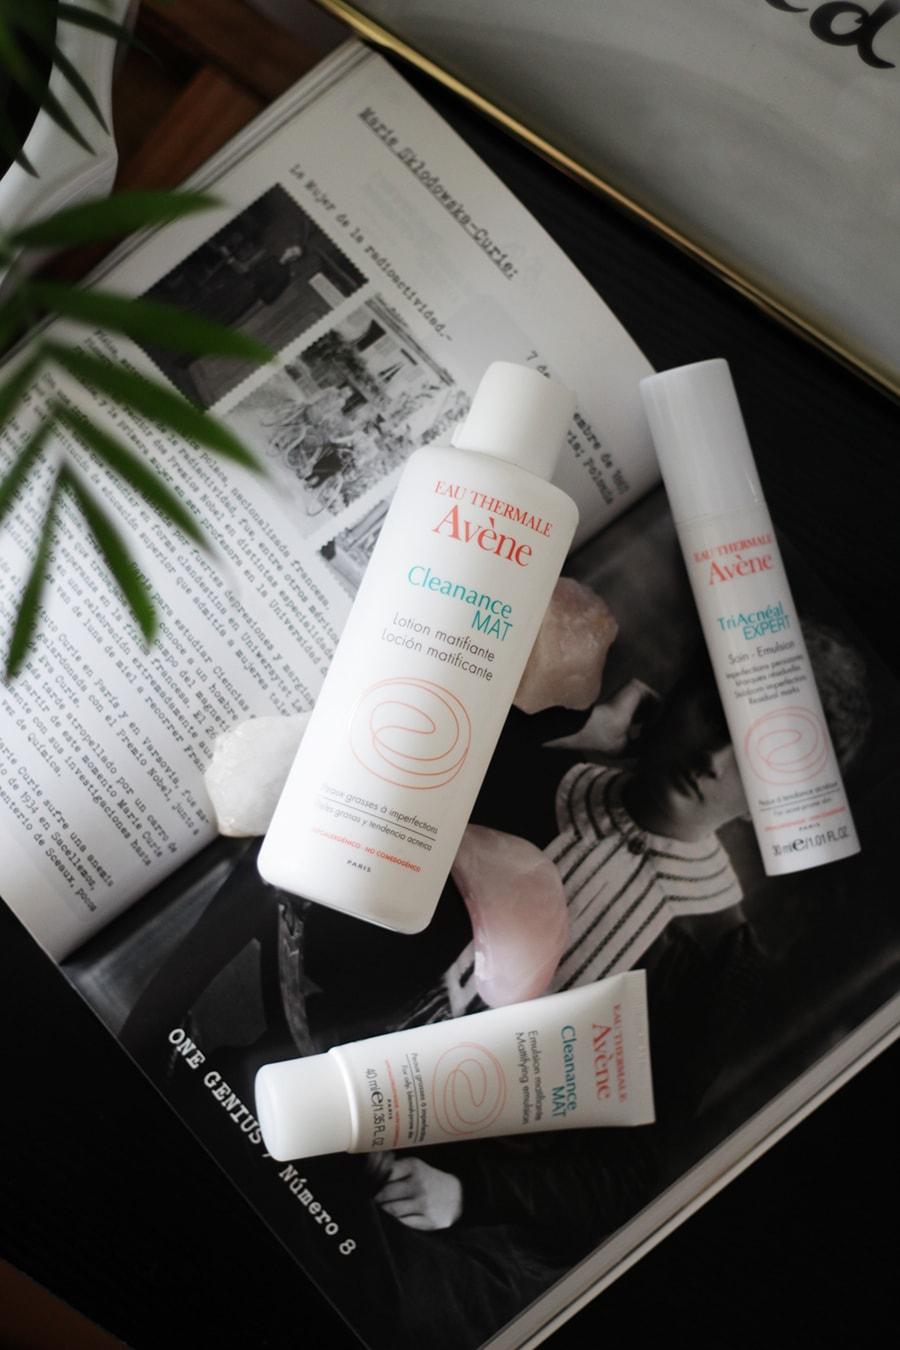 Eau Thermale Avene - Cleanance MAT - TriAcneal Expert - Skin care - acne puntos negros granos - cuidado de la piel